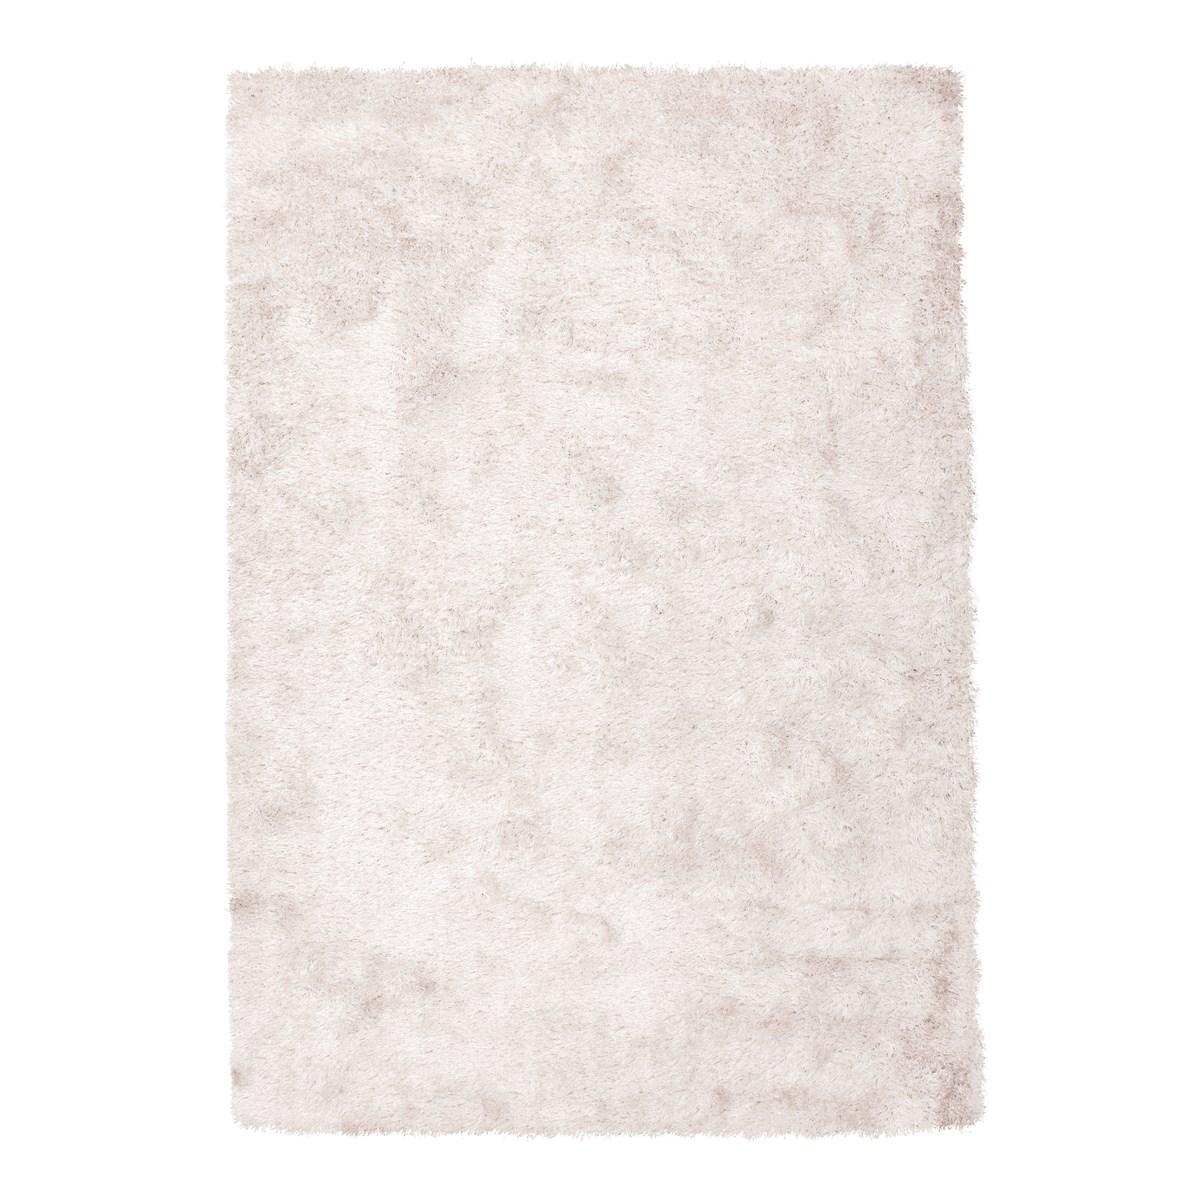 Tapis shaggy en Polyester Blanc cassé 200x290 cm